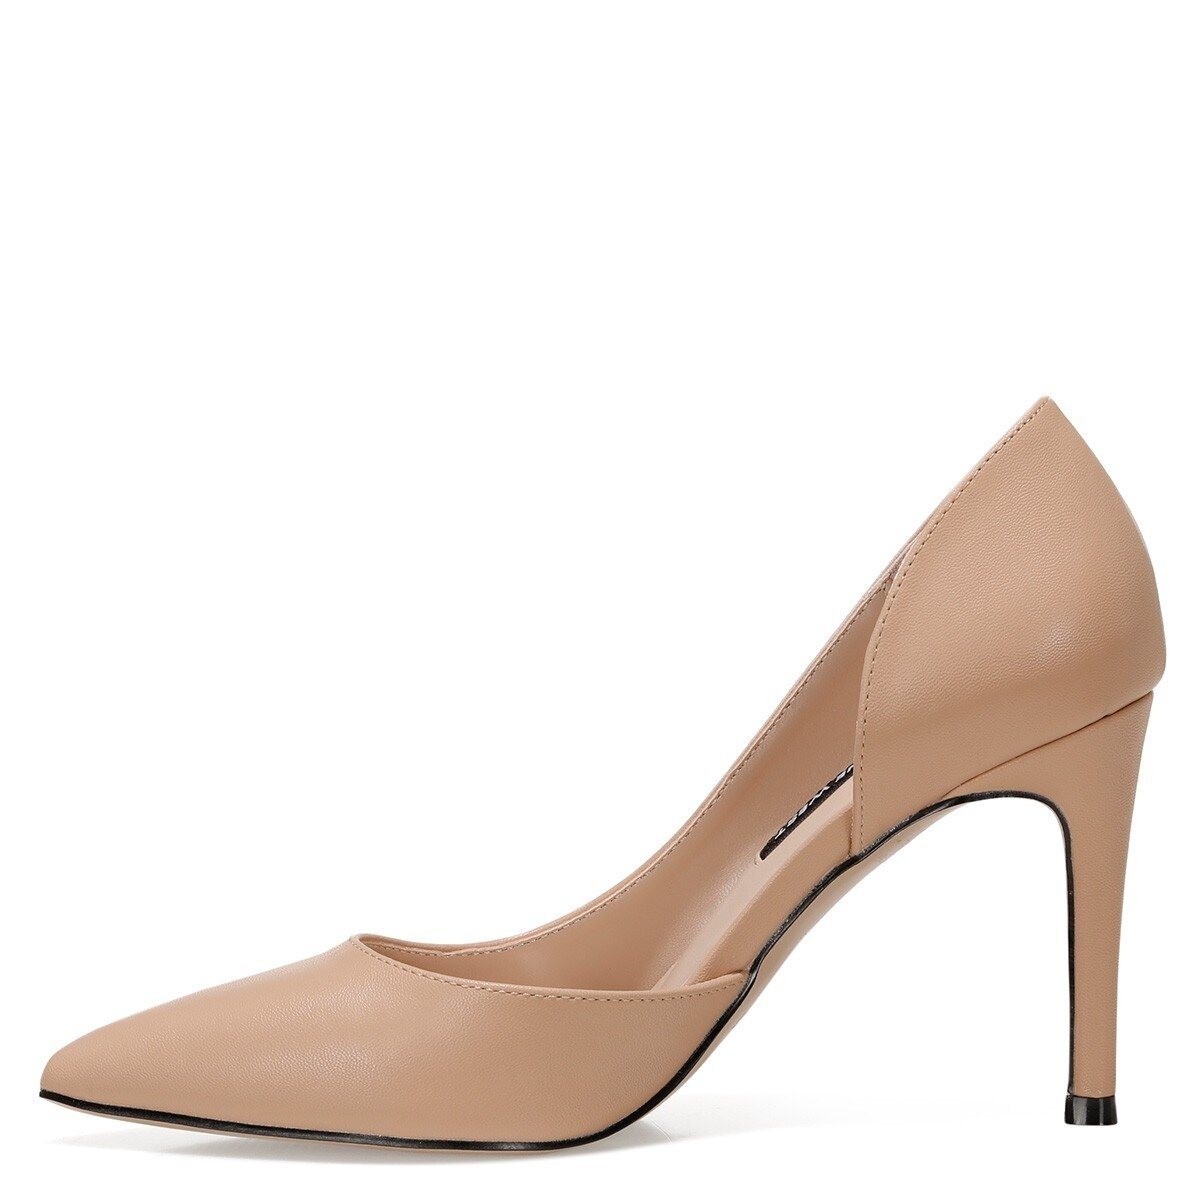 TIANA 1FX Naturel Kadın Gova Ayakkabı